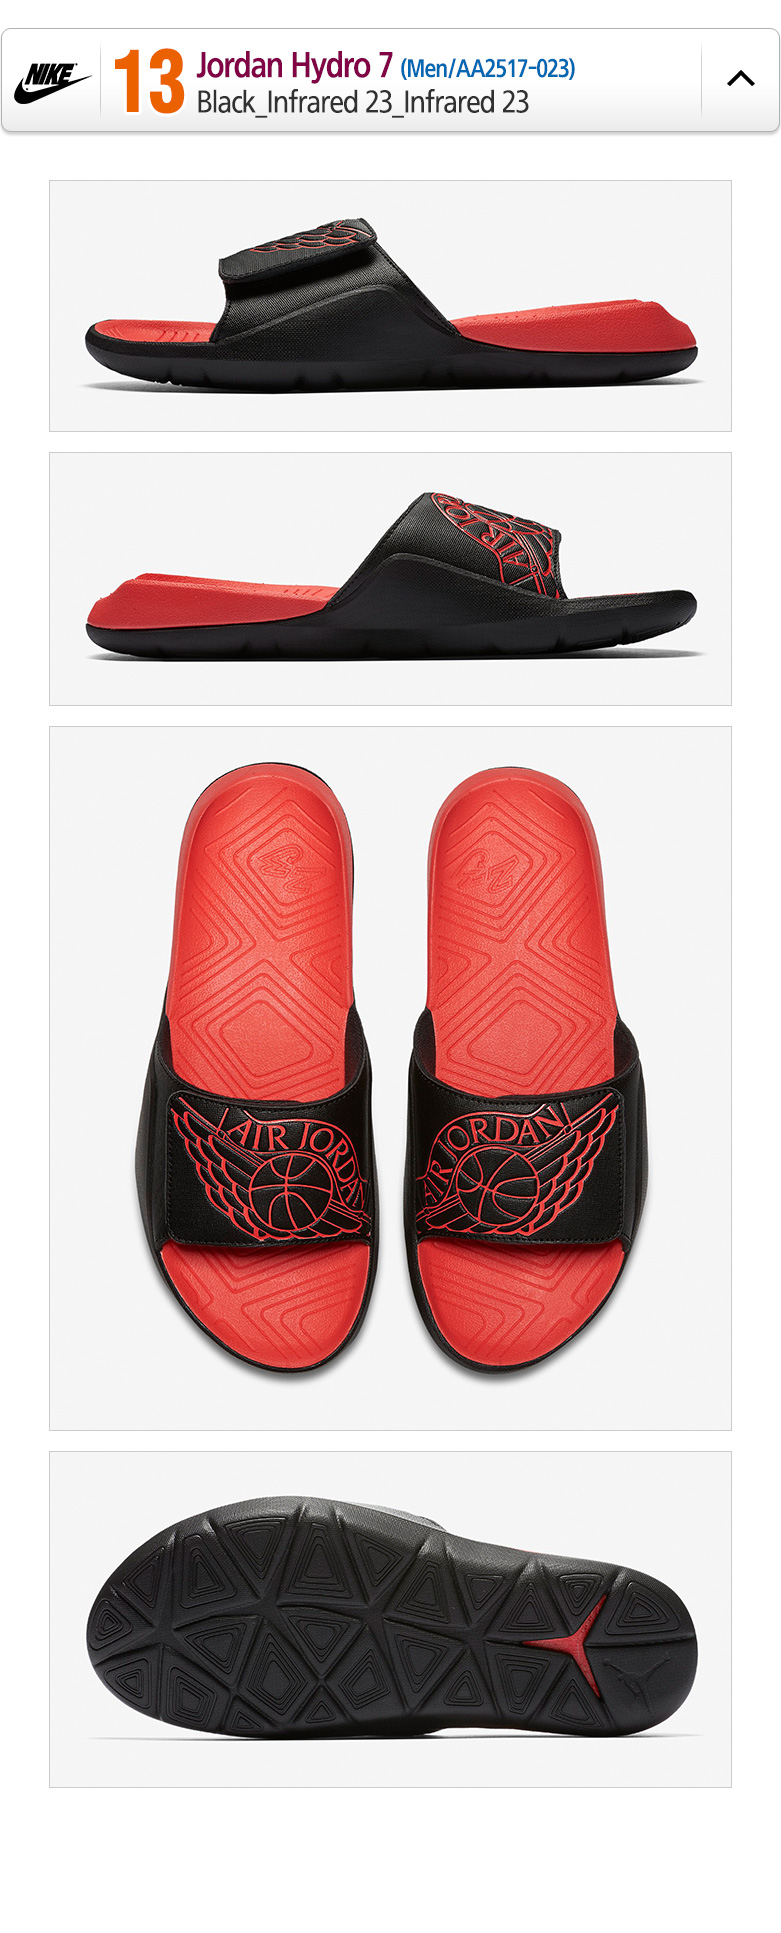 4eca0378f61cd 01 Nike Jordan Slides Hydro 7 6 Men Women s Couple - 11STREET